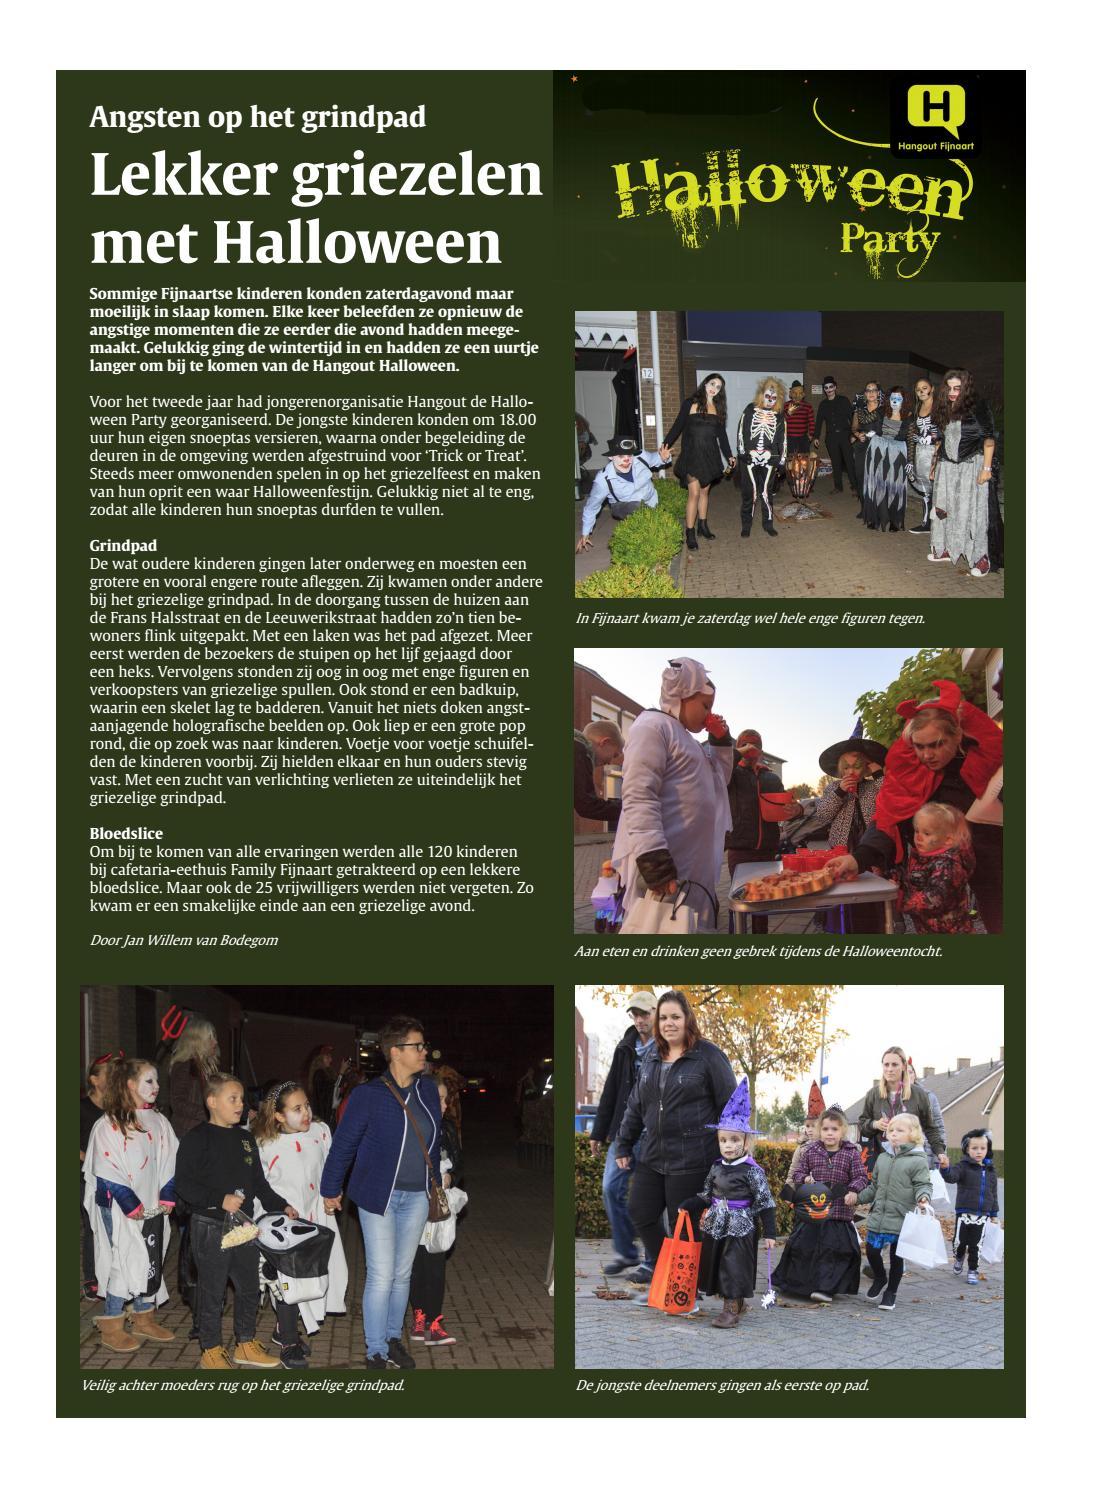 Halloween Eten Kinderen.Fendert Lokaal 2016 Week 44 By Fendert Lokaal Issuu